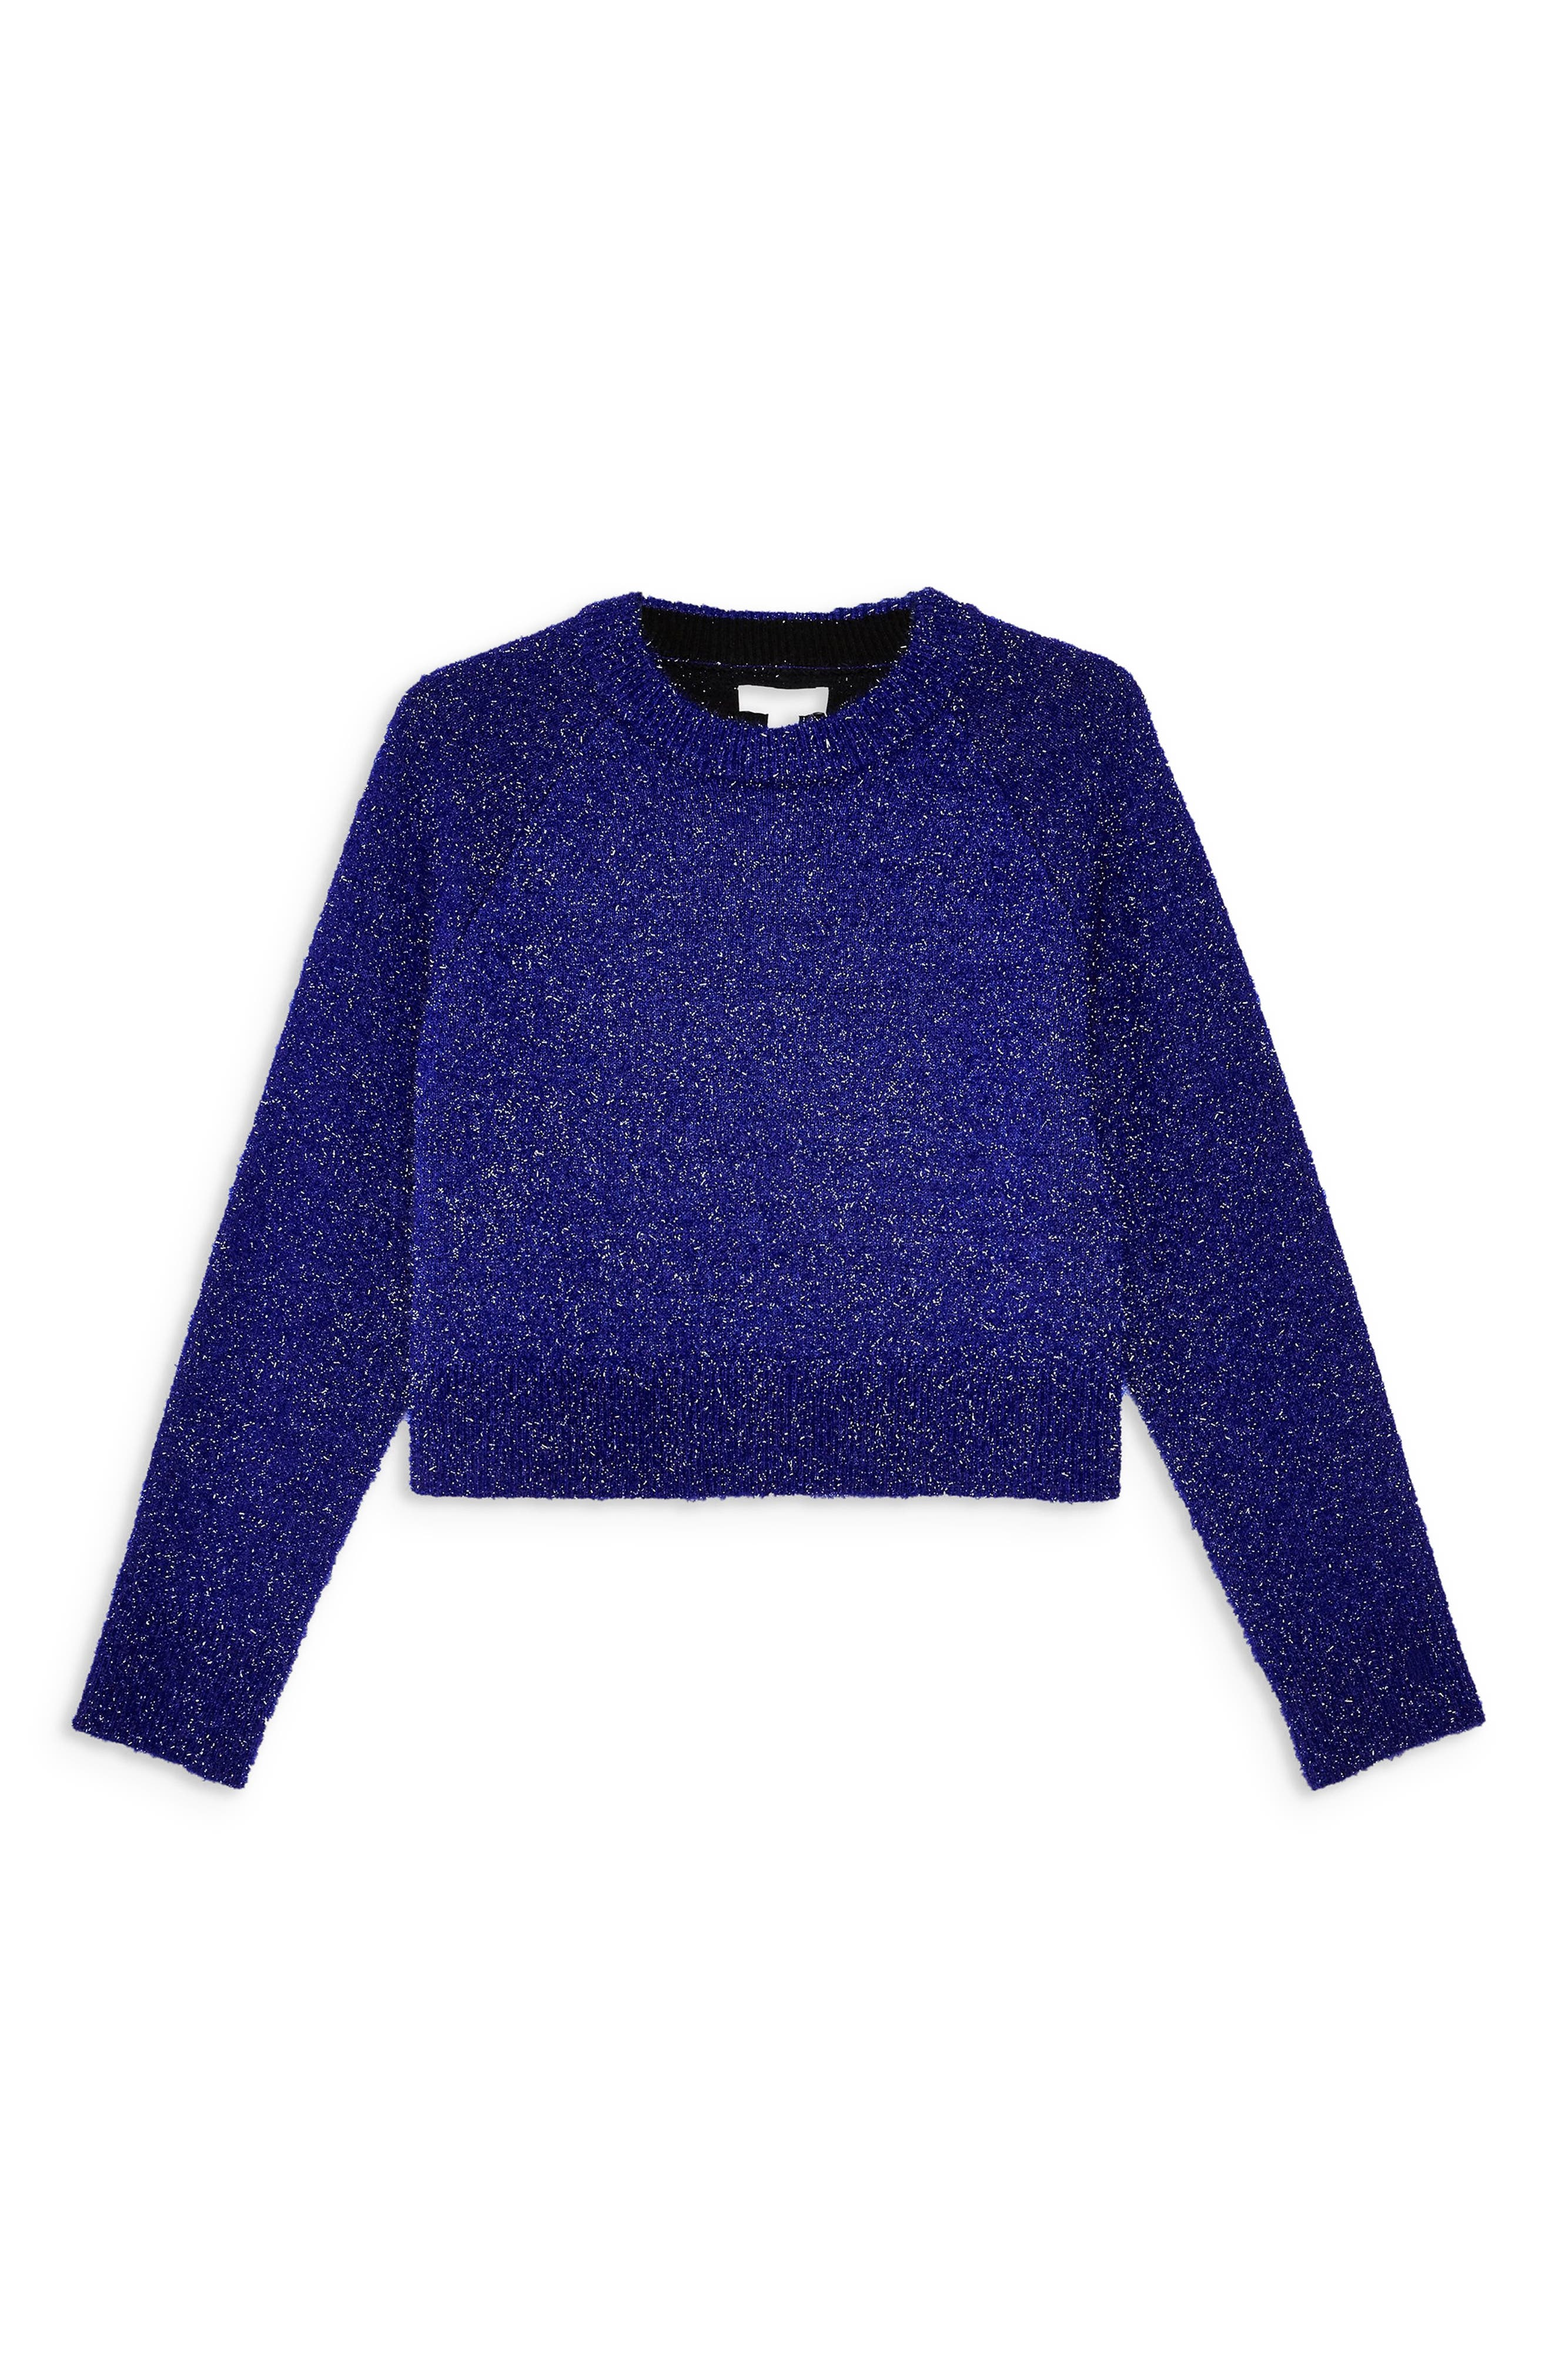 Metallic Crop Sweater,                             Alternate thumbnail 3, color,                             BLUE